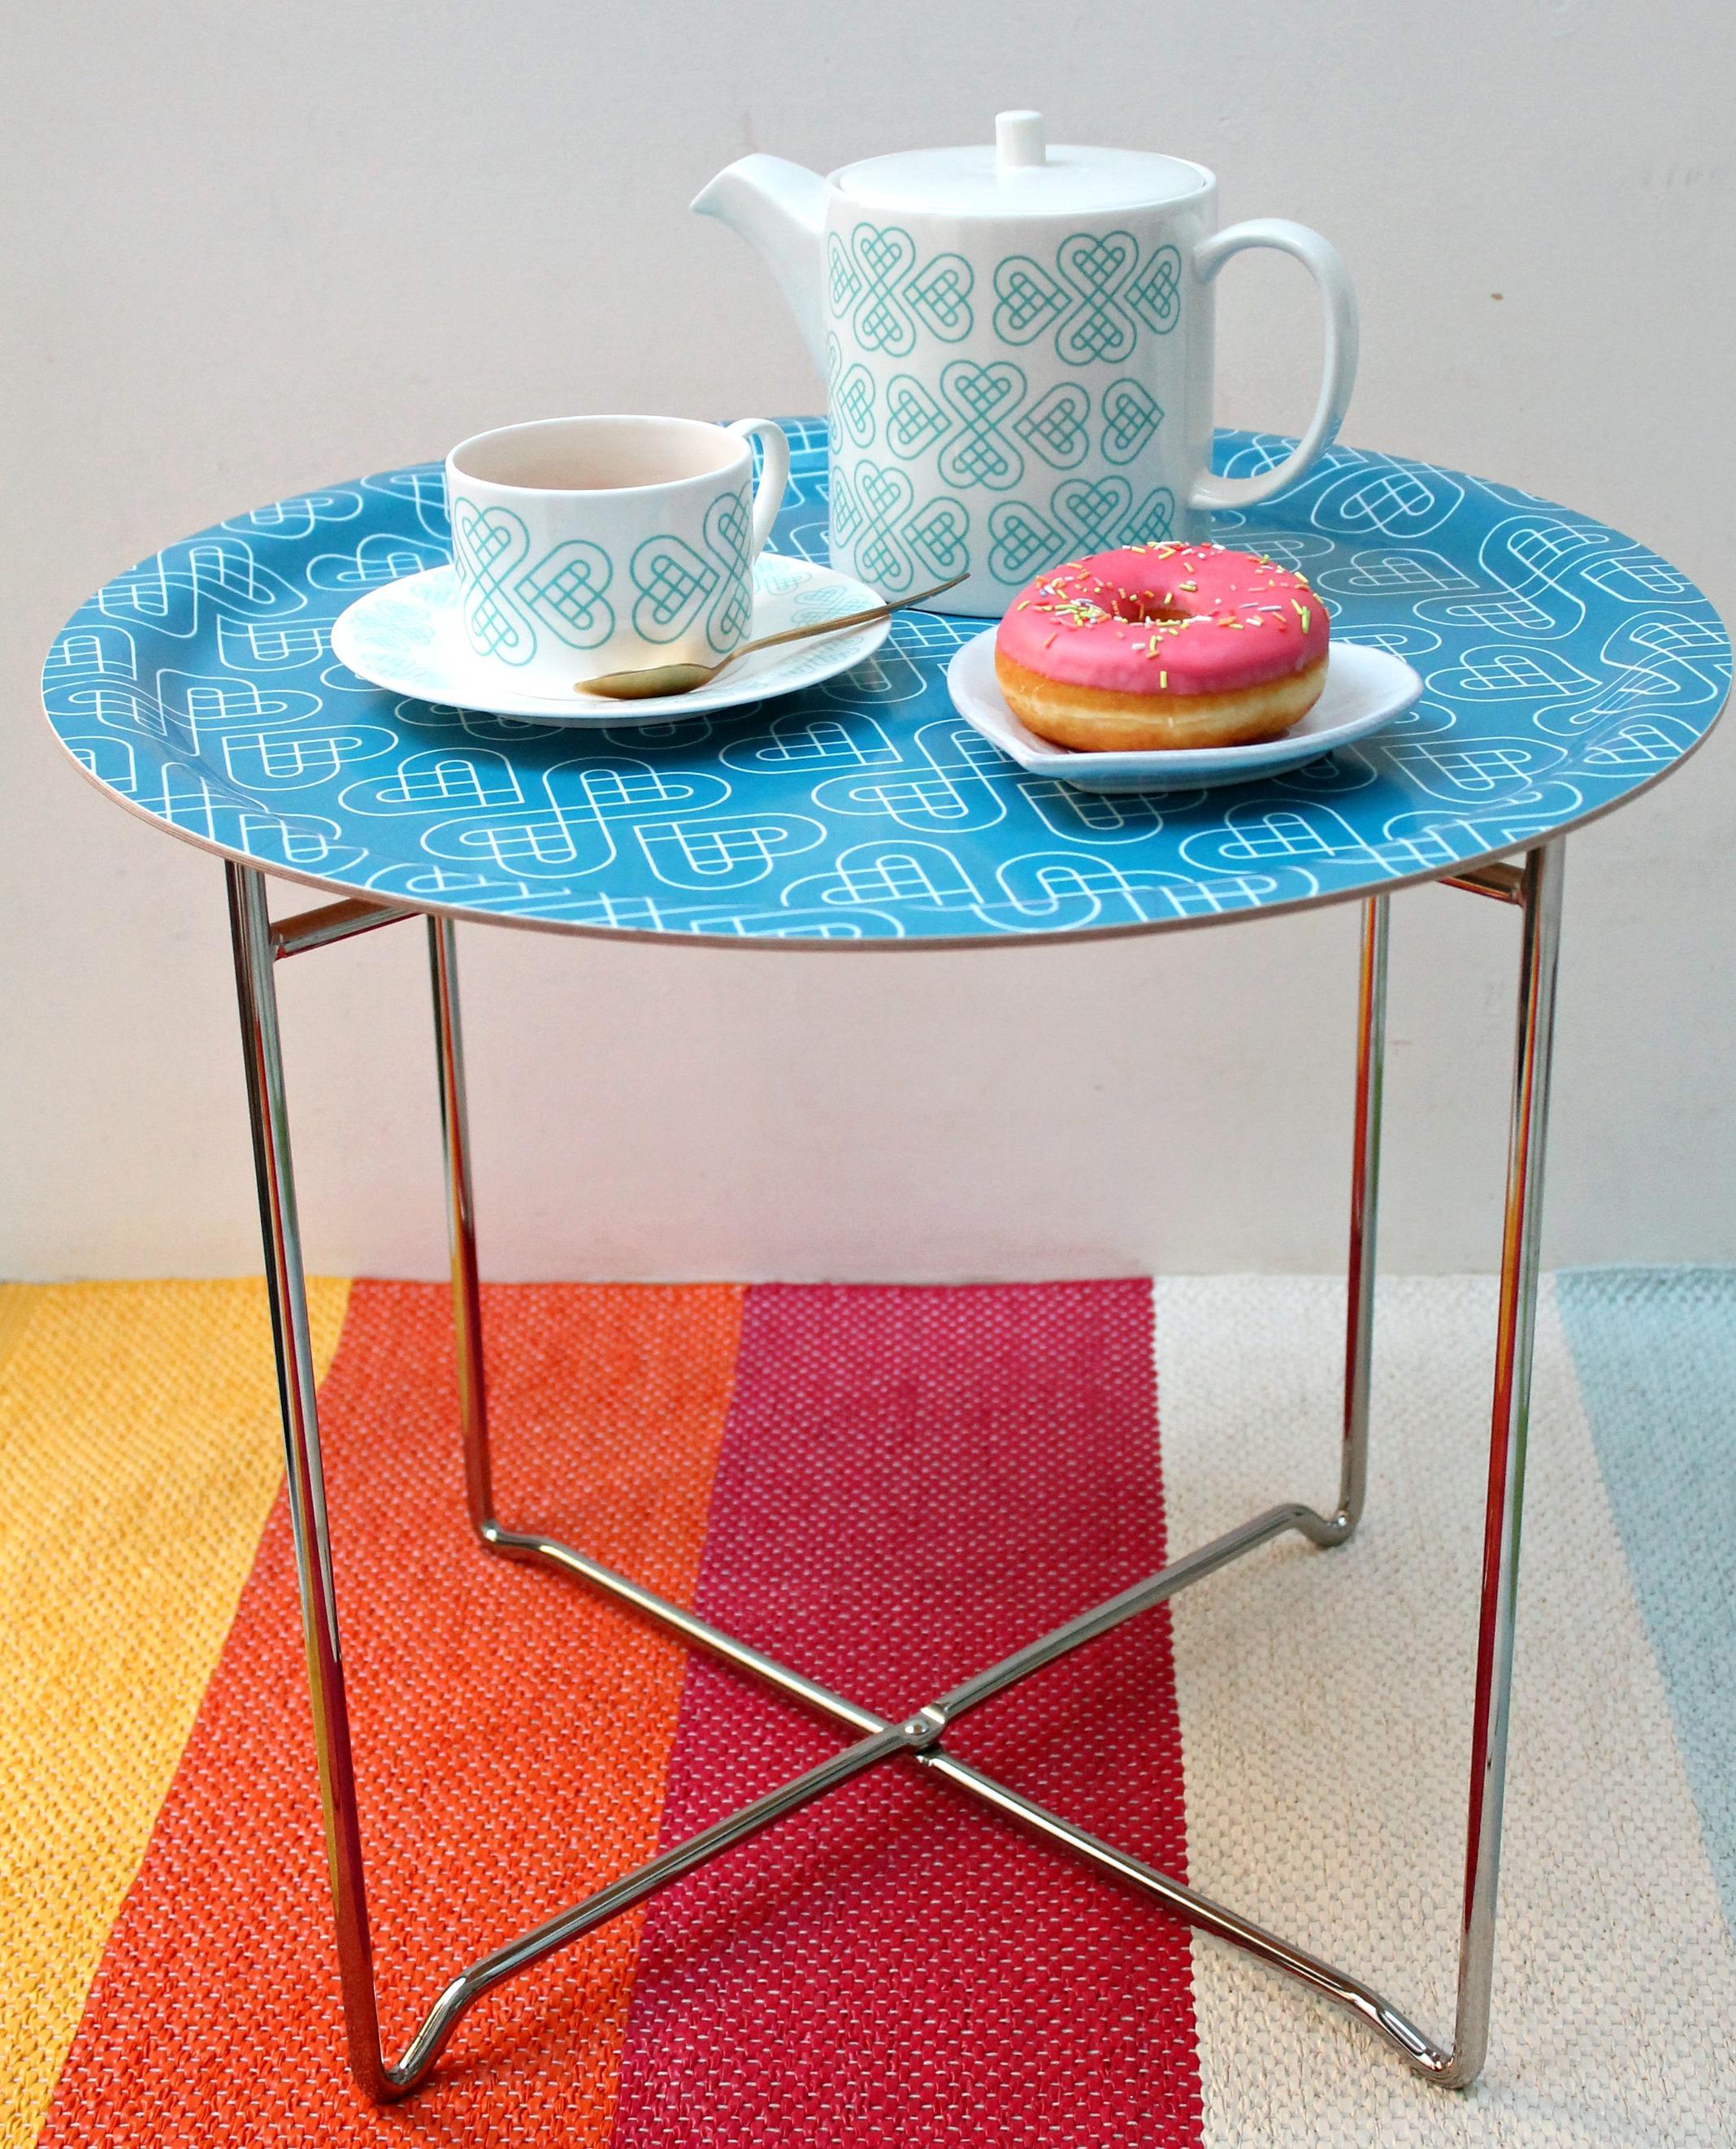 Cordello-home-tea-set-1-photo-by-Little-Big-Bell